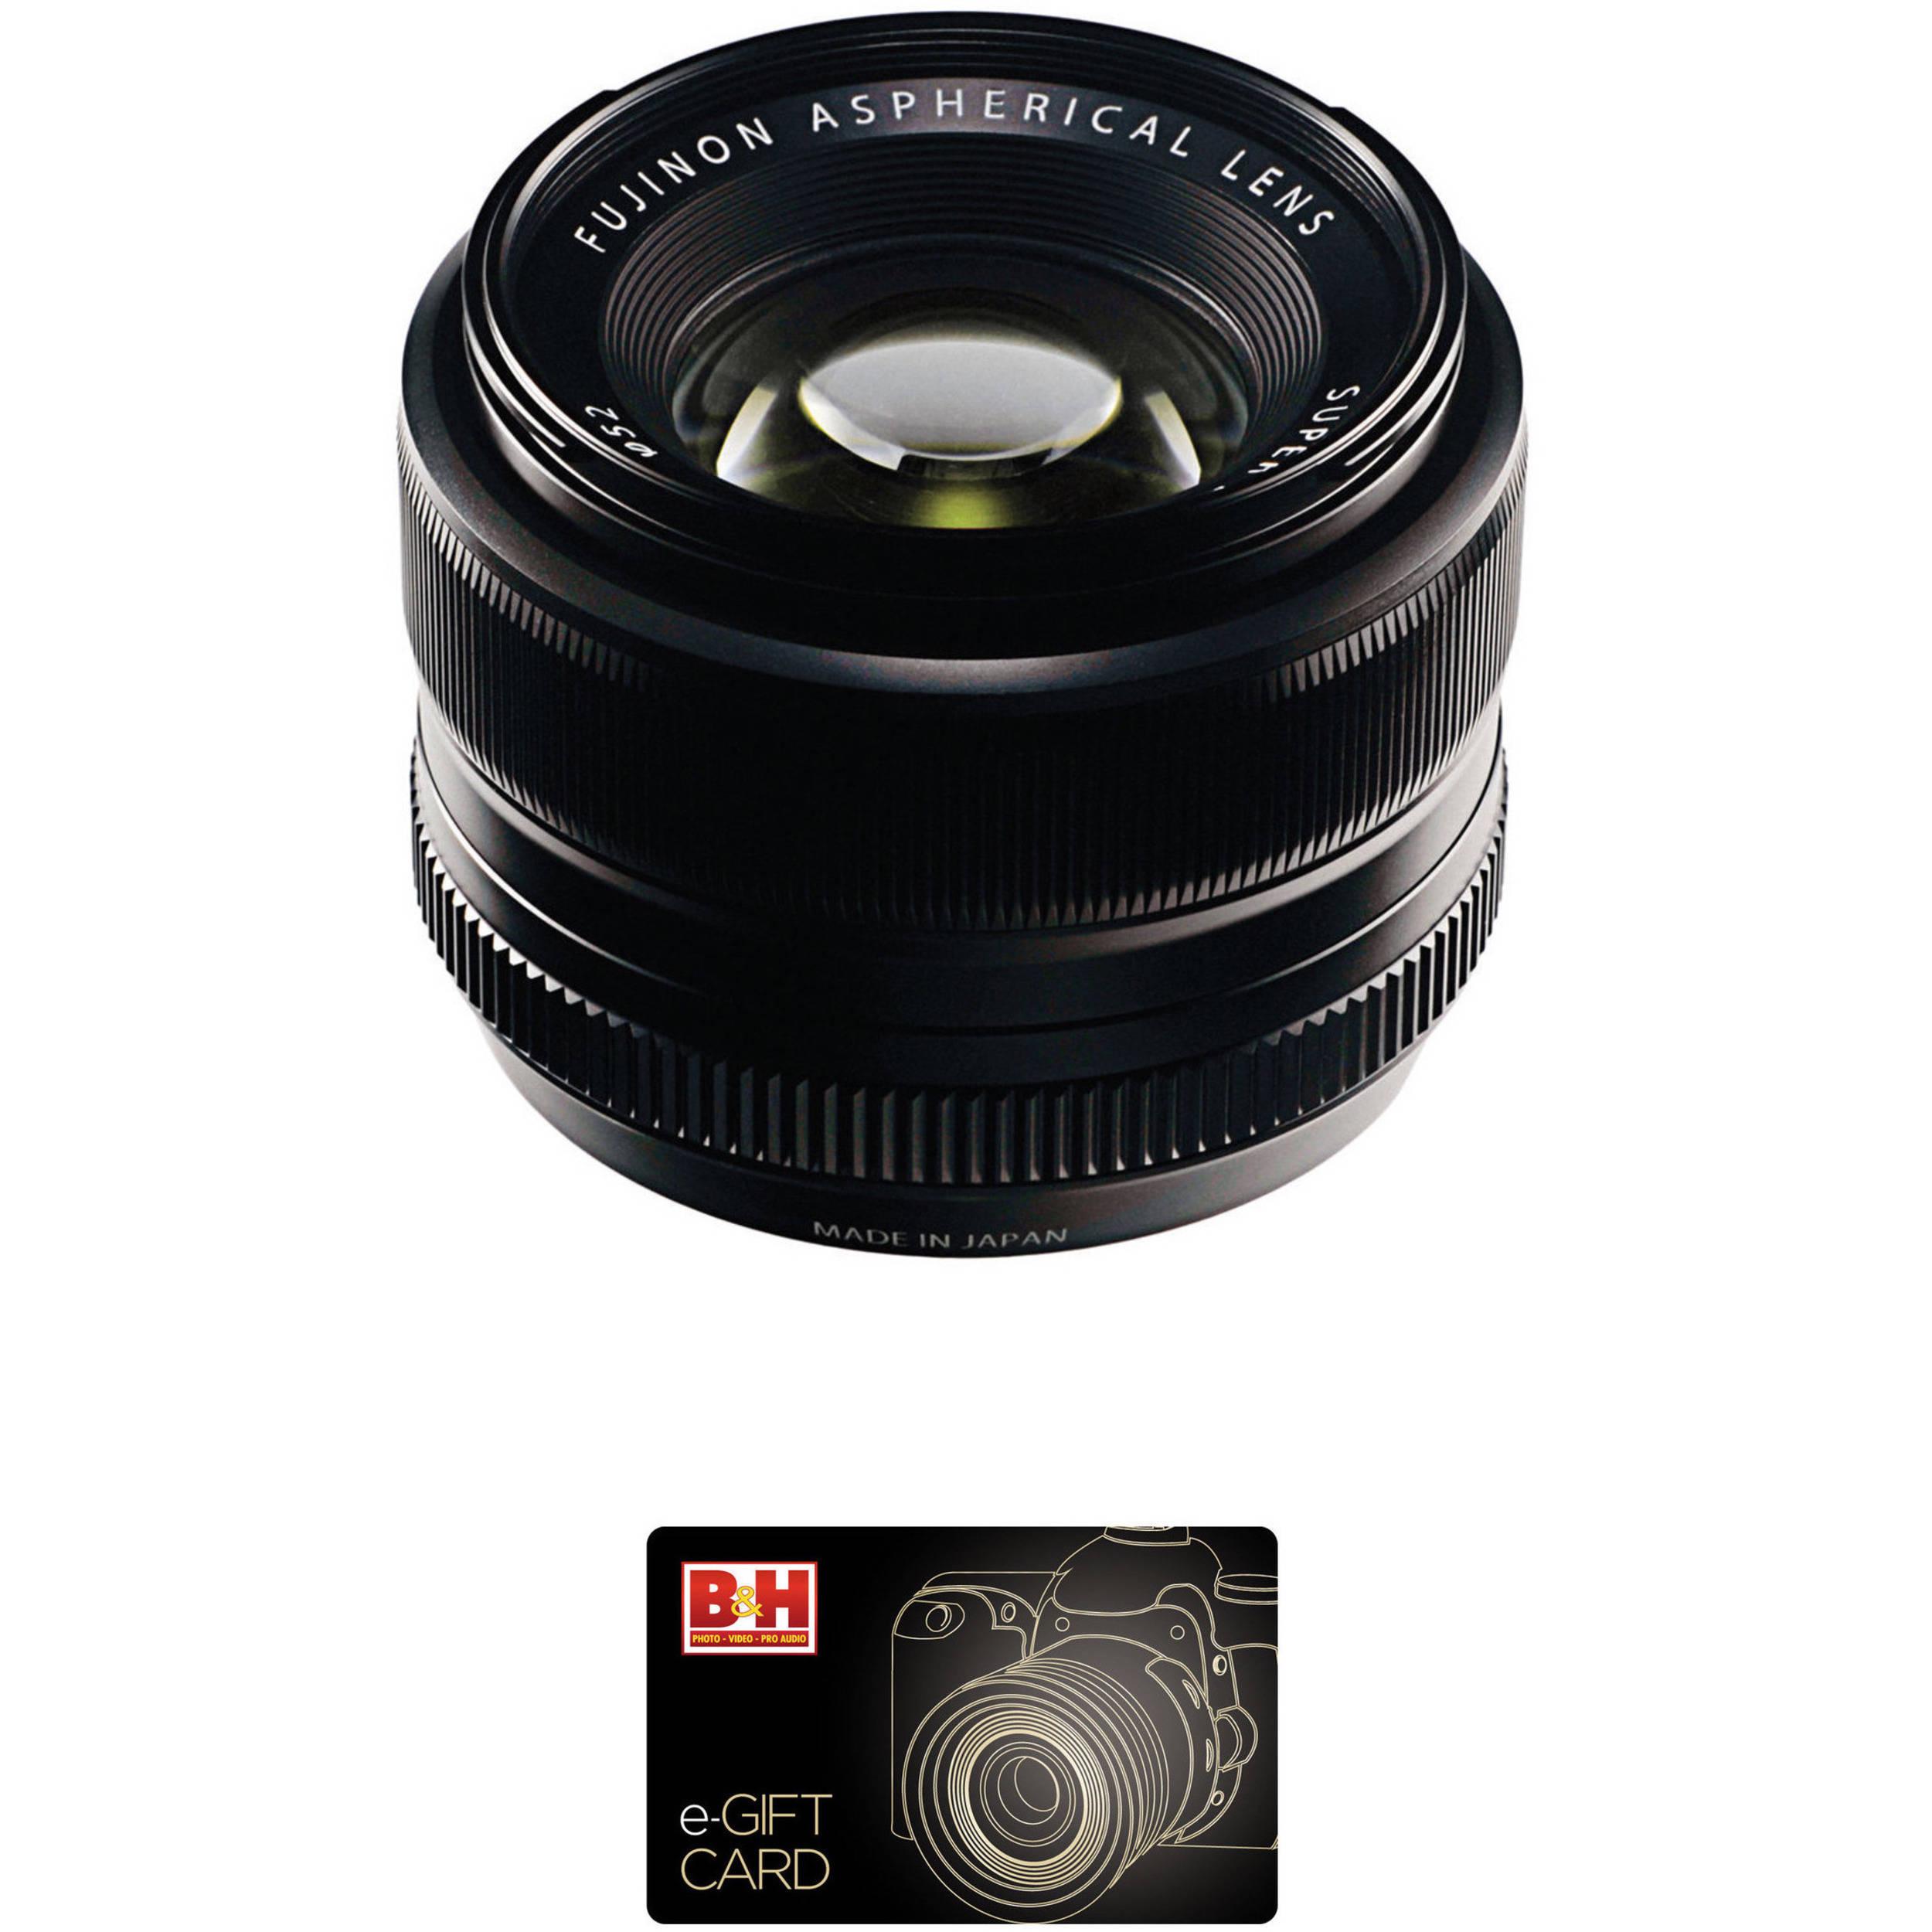 Tempat Jual Fujifilm X A5 Kit 15 45mm Brown Wifi 242mp Aps C Cmos T20 Xf18 55mmblack Instax Share Sp2 Pwp Xf 35mm F 2 Https Product 1393646 Reg